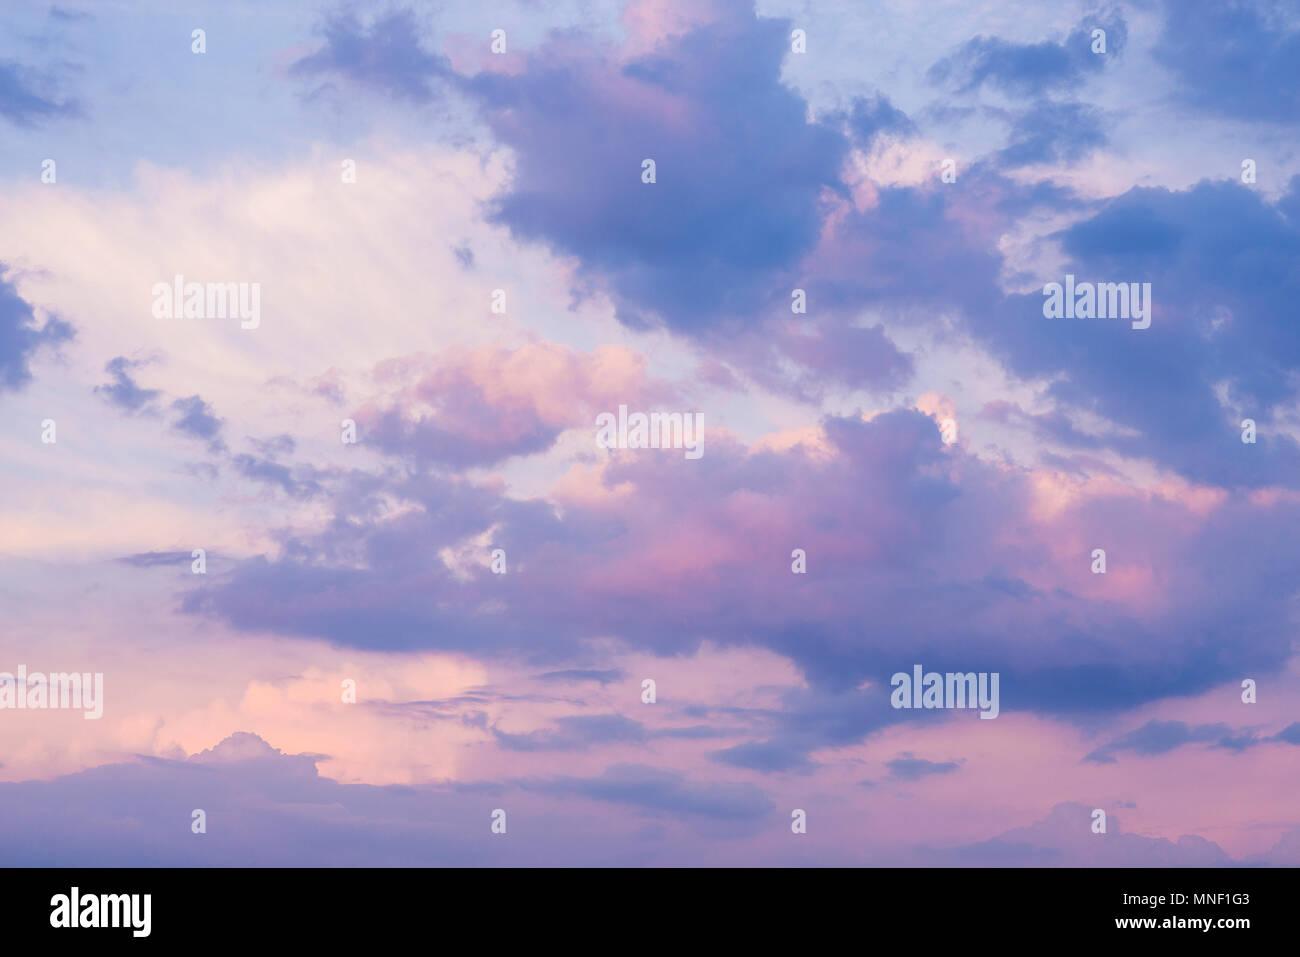 Purple cloudy colorful sky horizontal - Stock Image